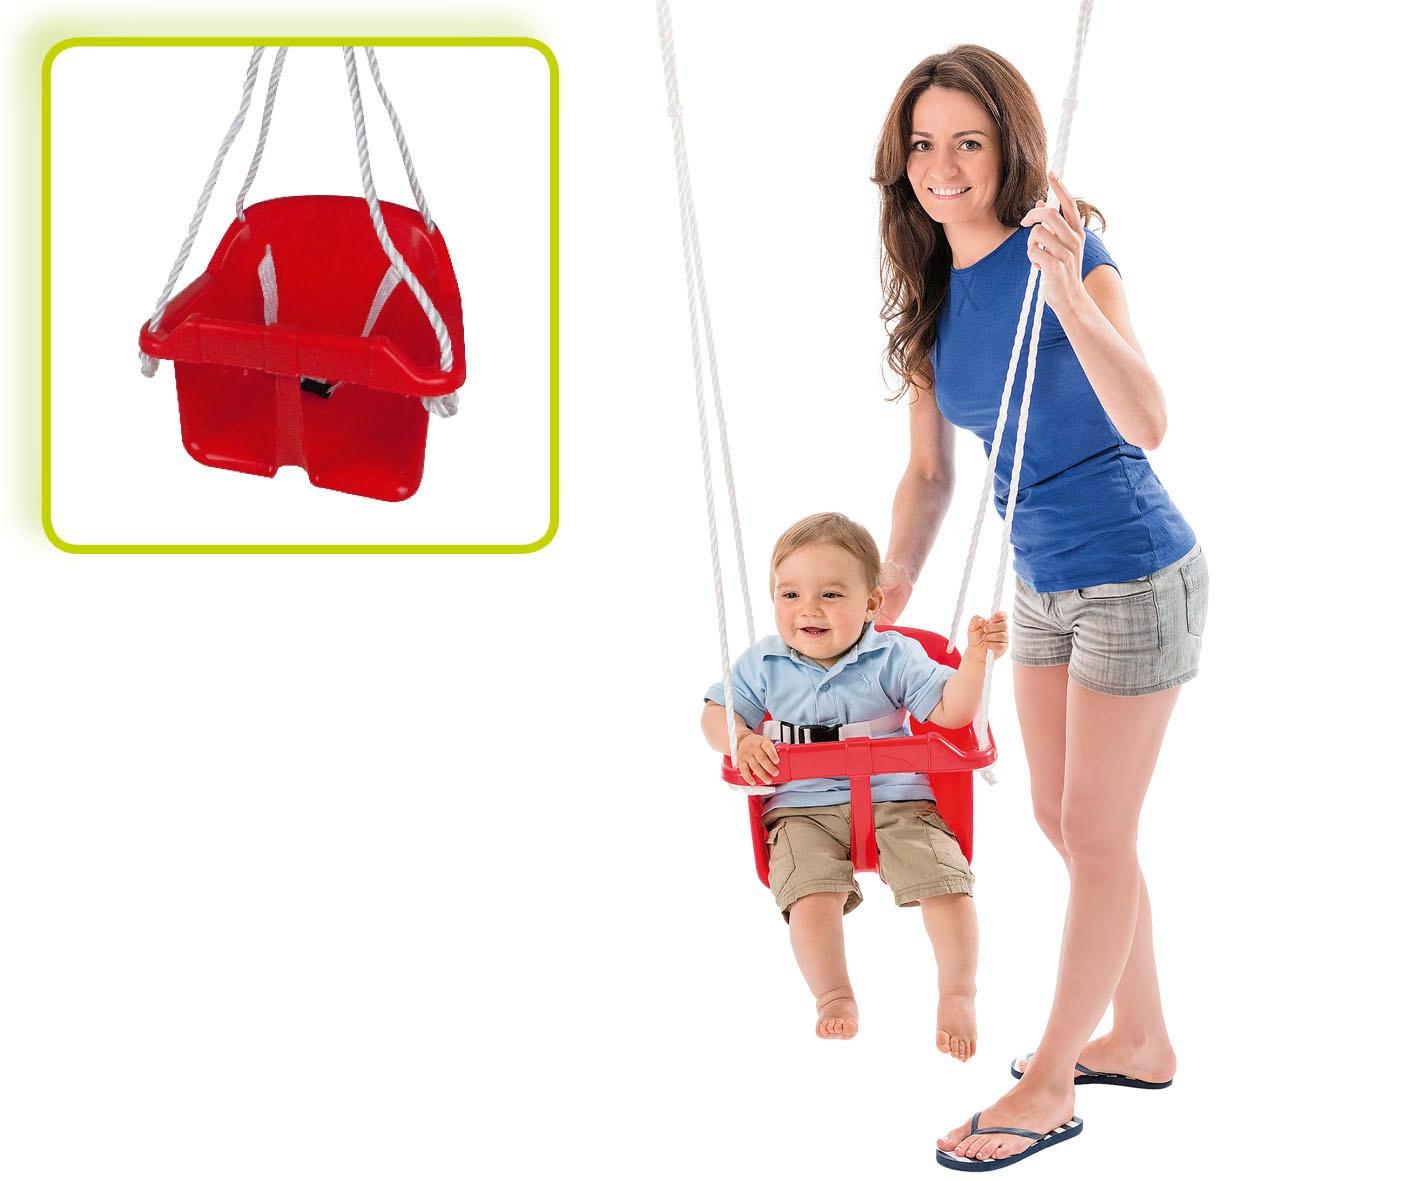 Happy People babyschaukelsitz mit Seil 31 cm rot